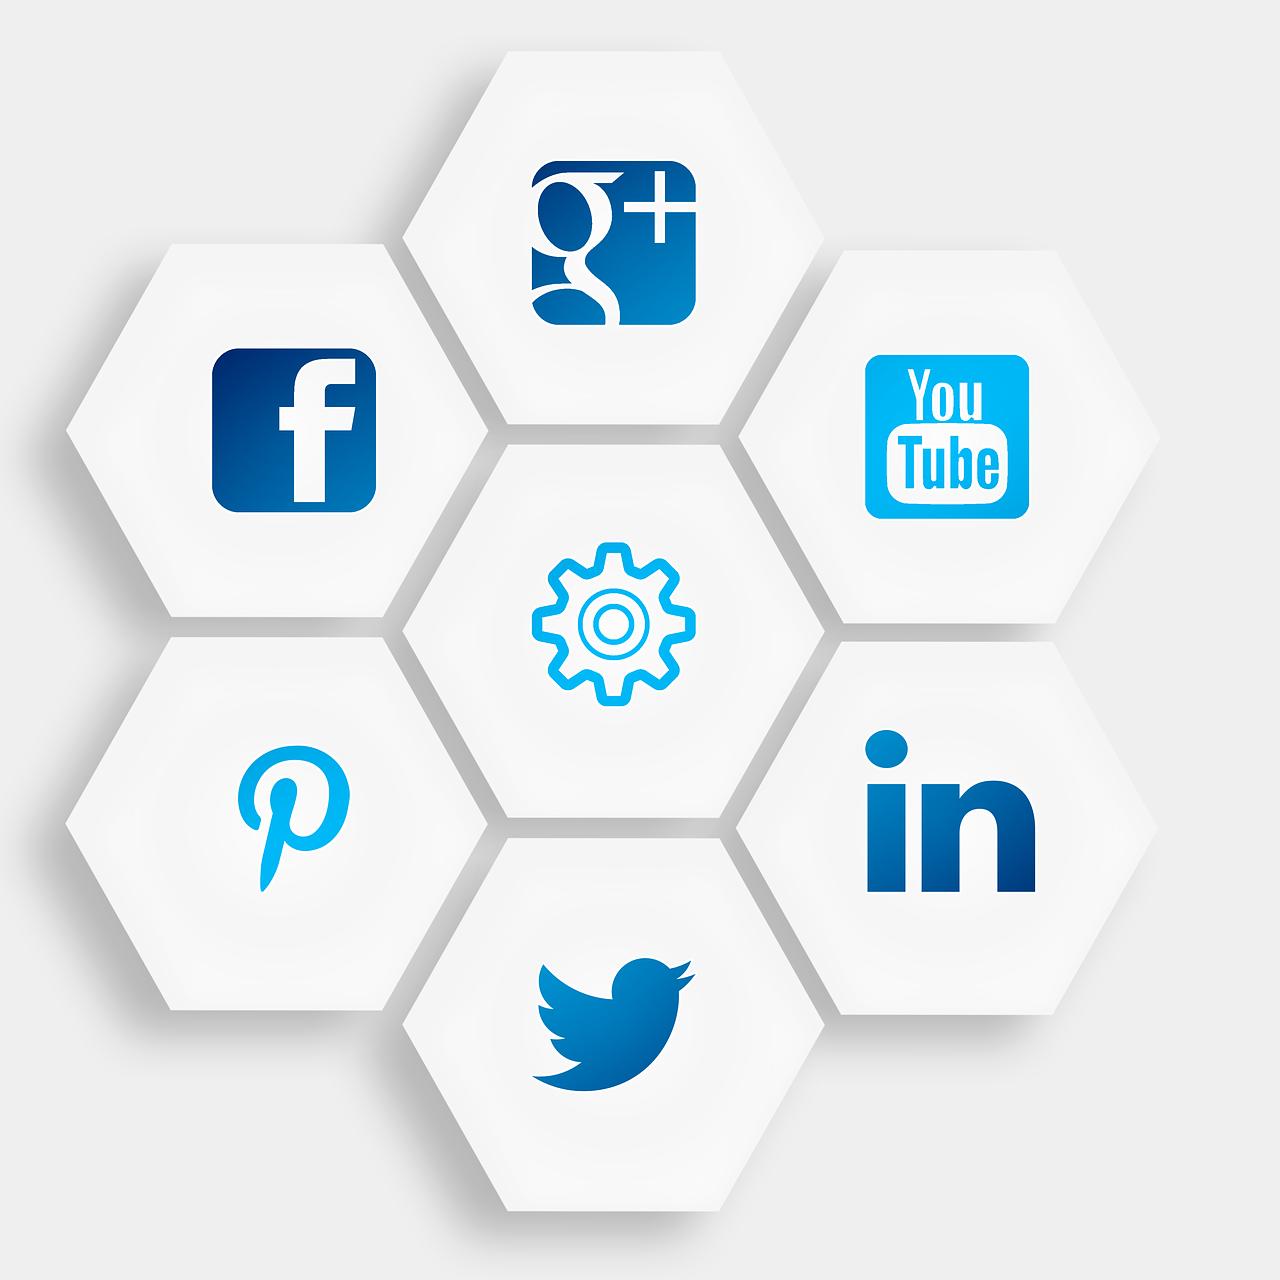 Stikky Media social media services